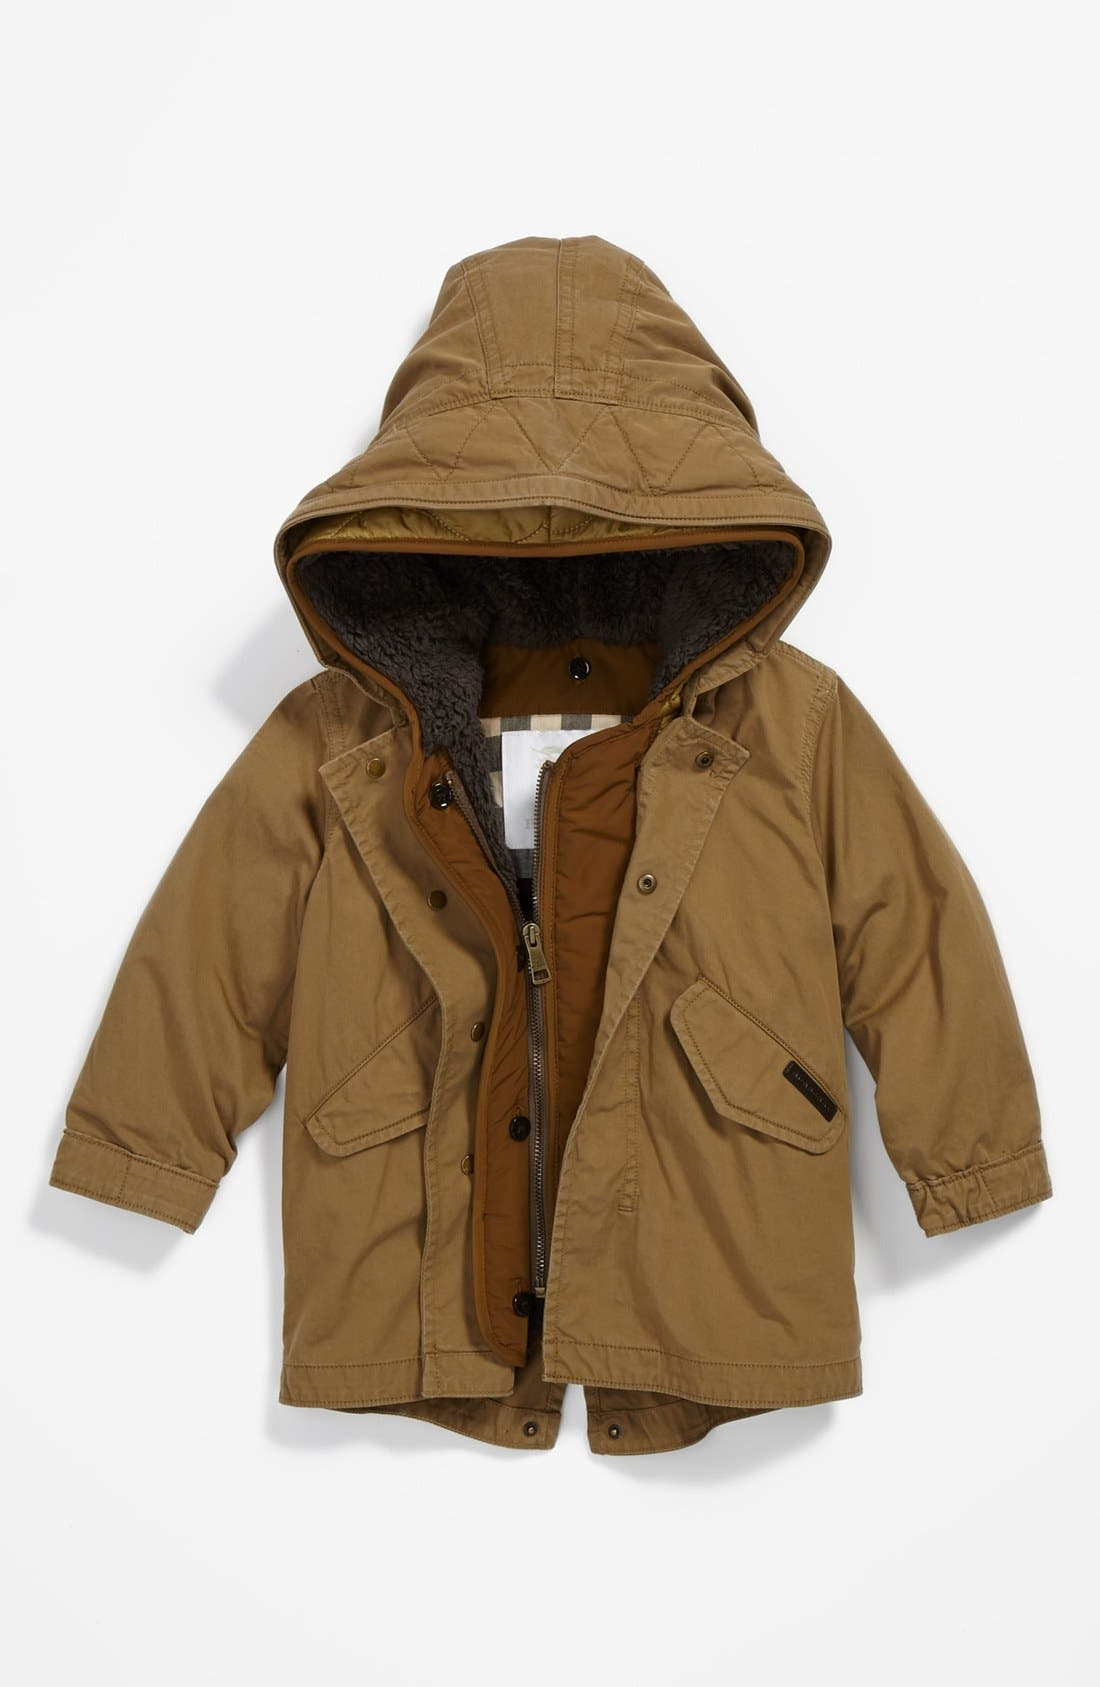 Alternate Image 1 Selected - Burberry 'Chaundler' Coat (Toddler Boys)